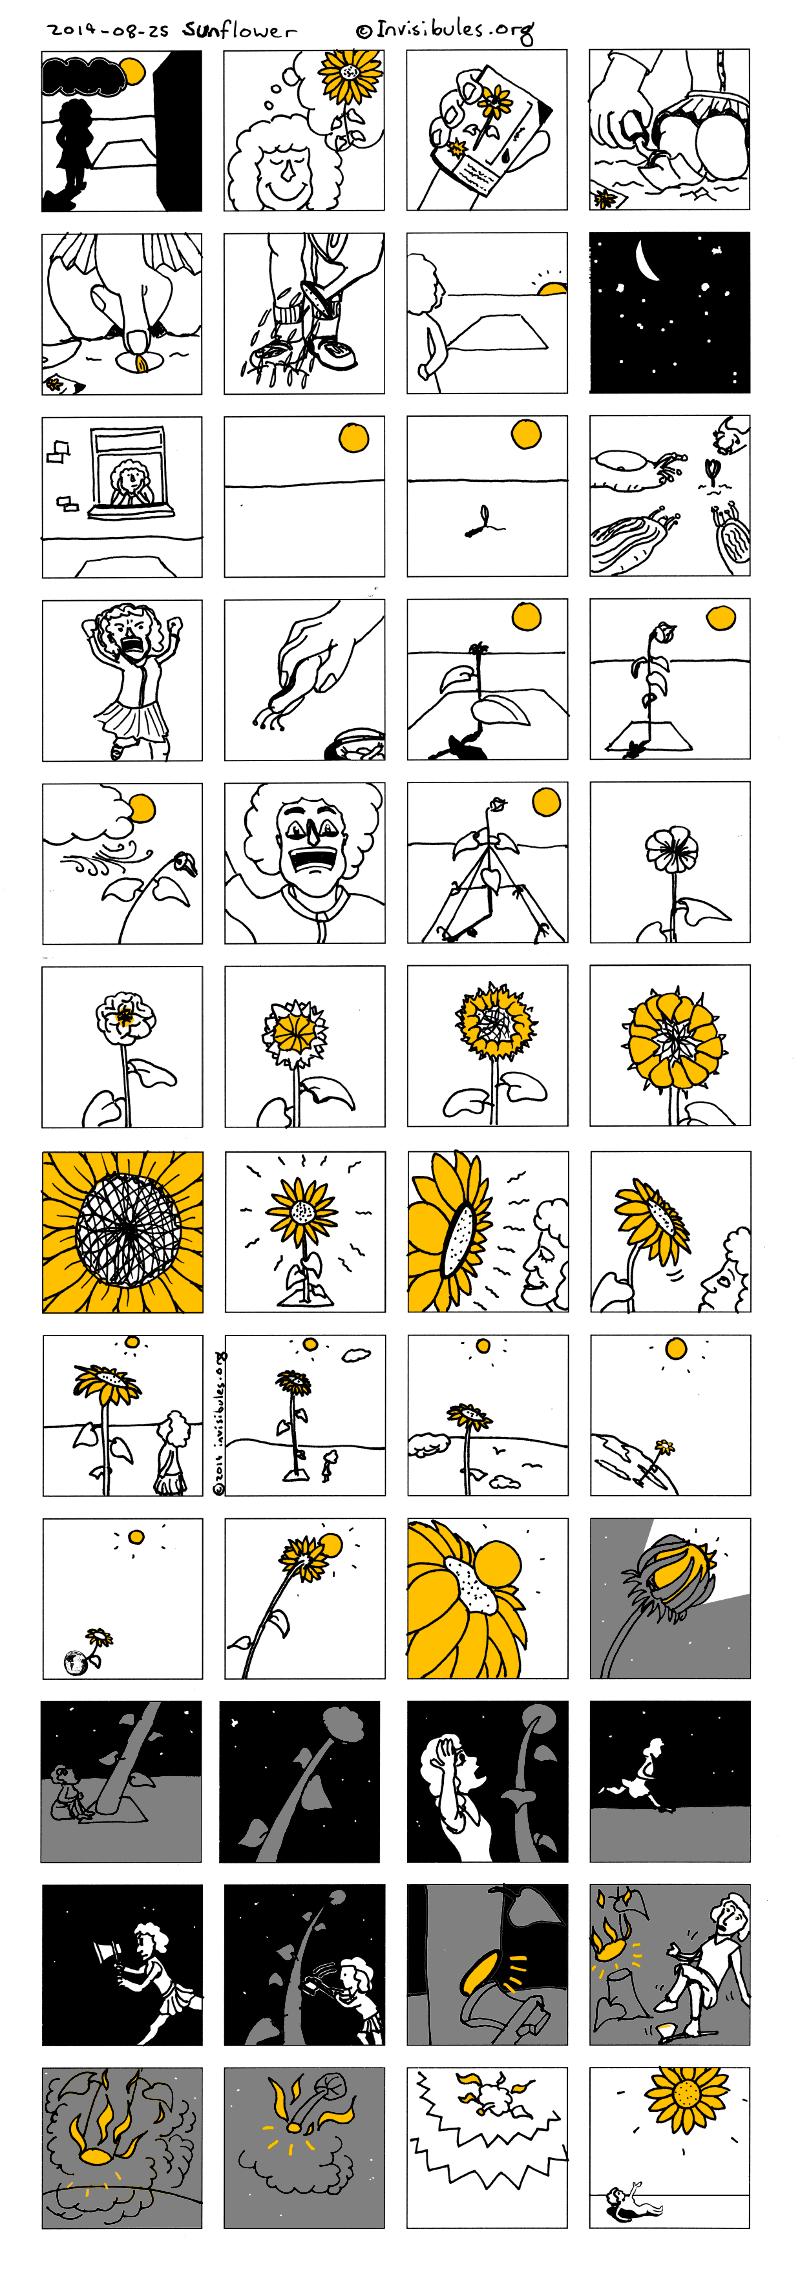 2014-08-28 Sunflower